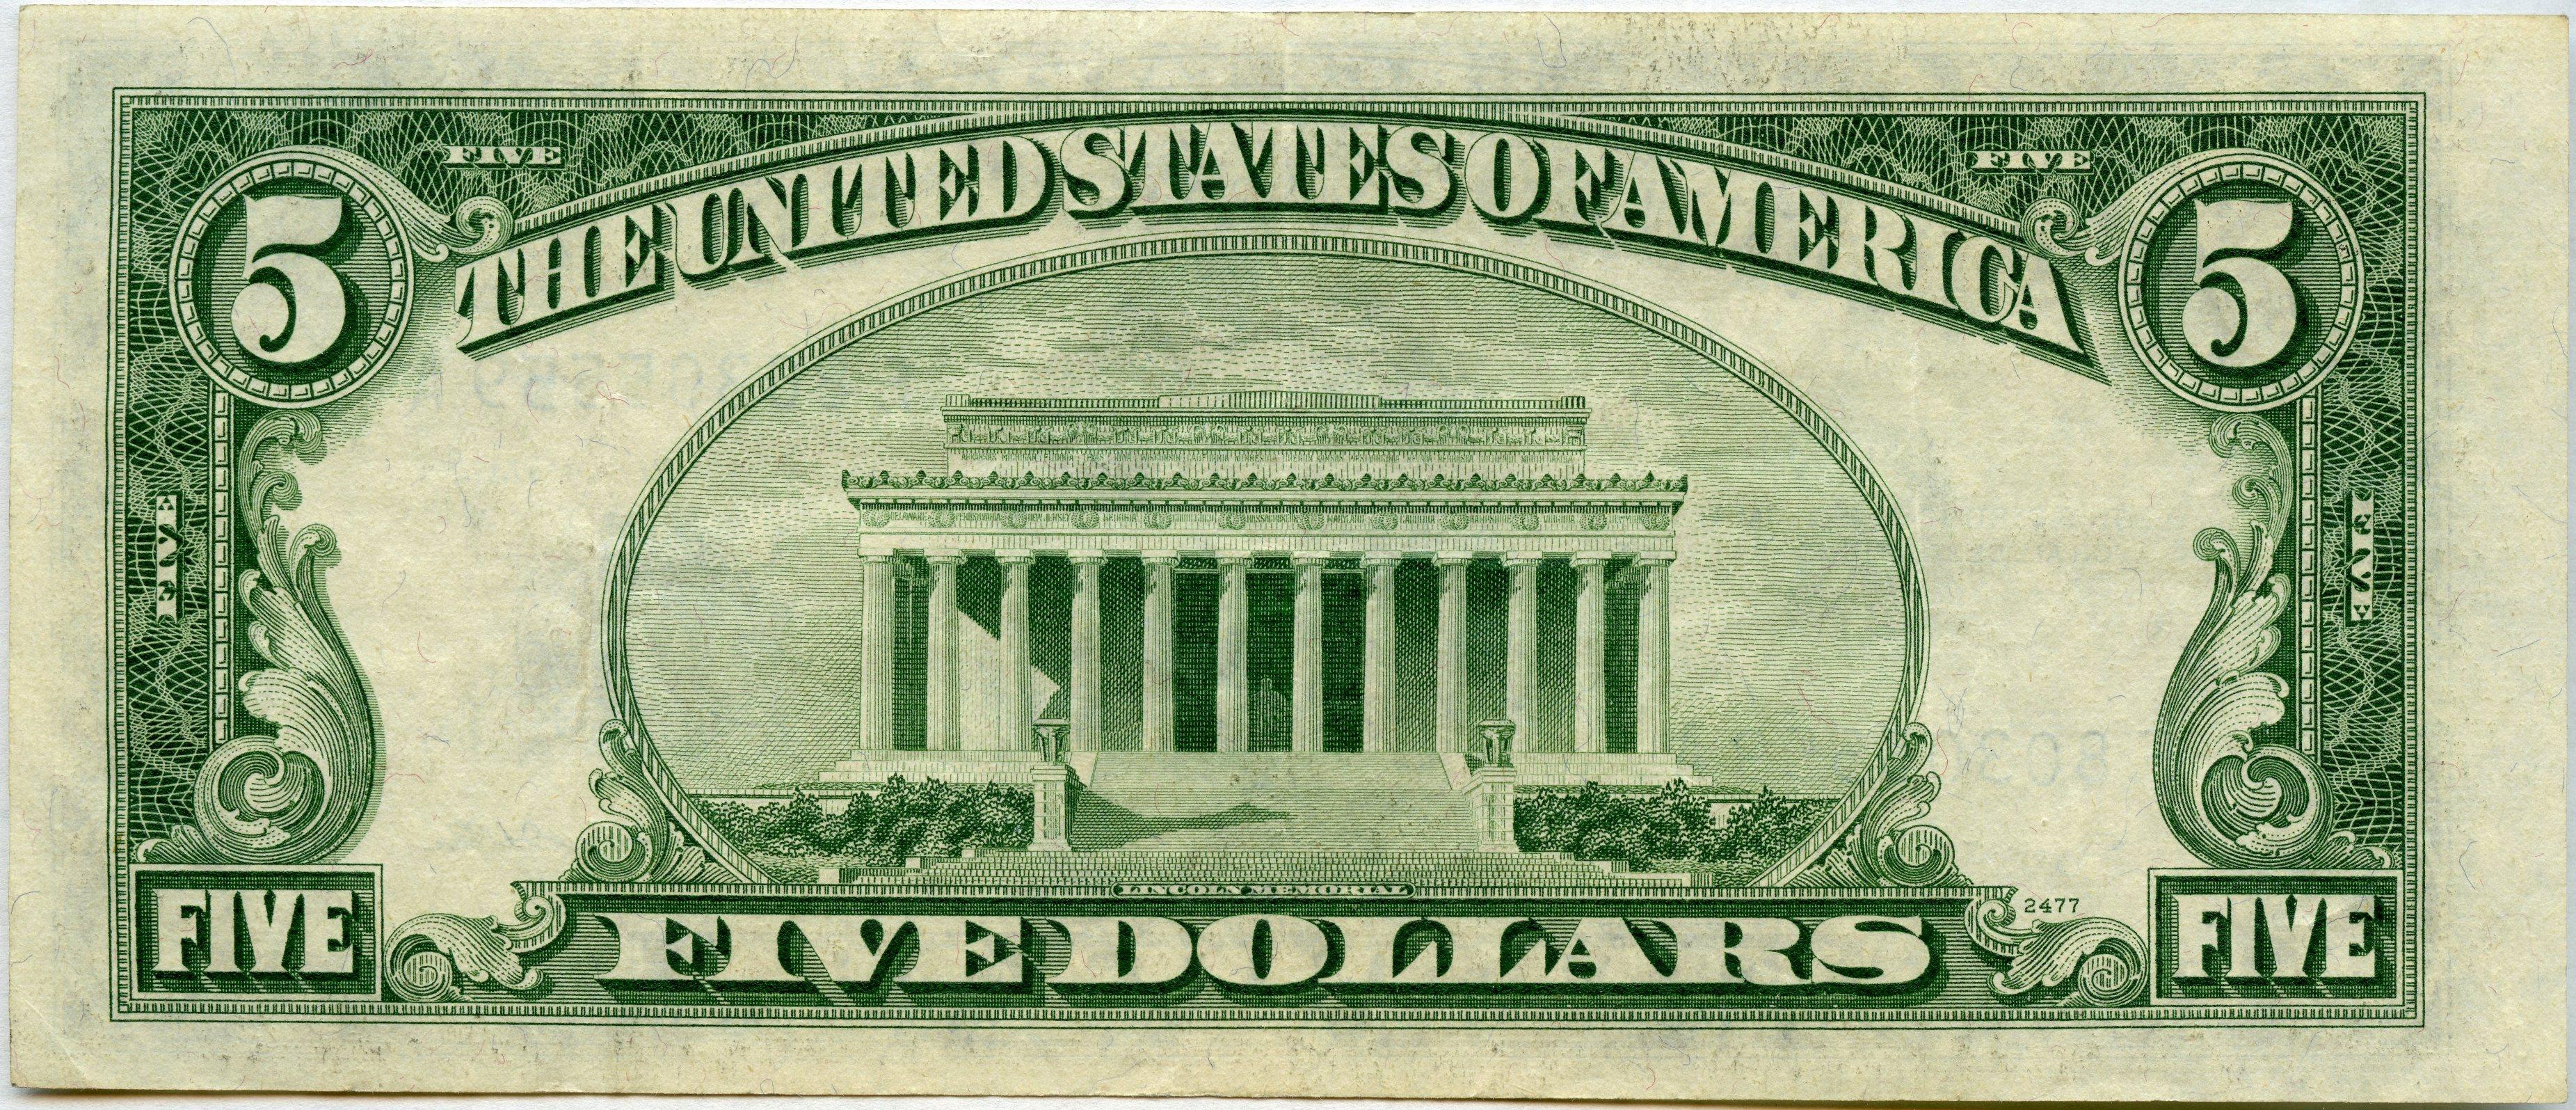 500 Silver Certificate Series 1934 B F80305559a F1657 Xf